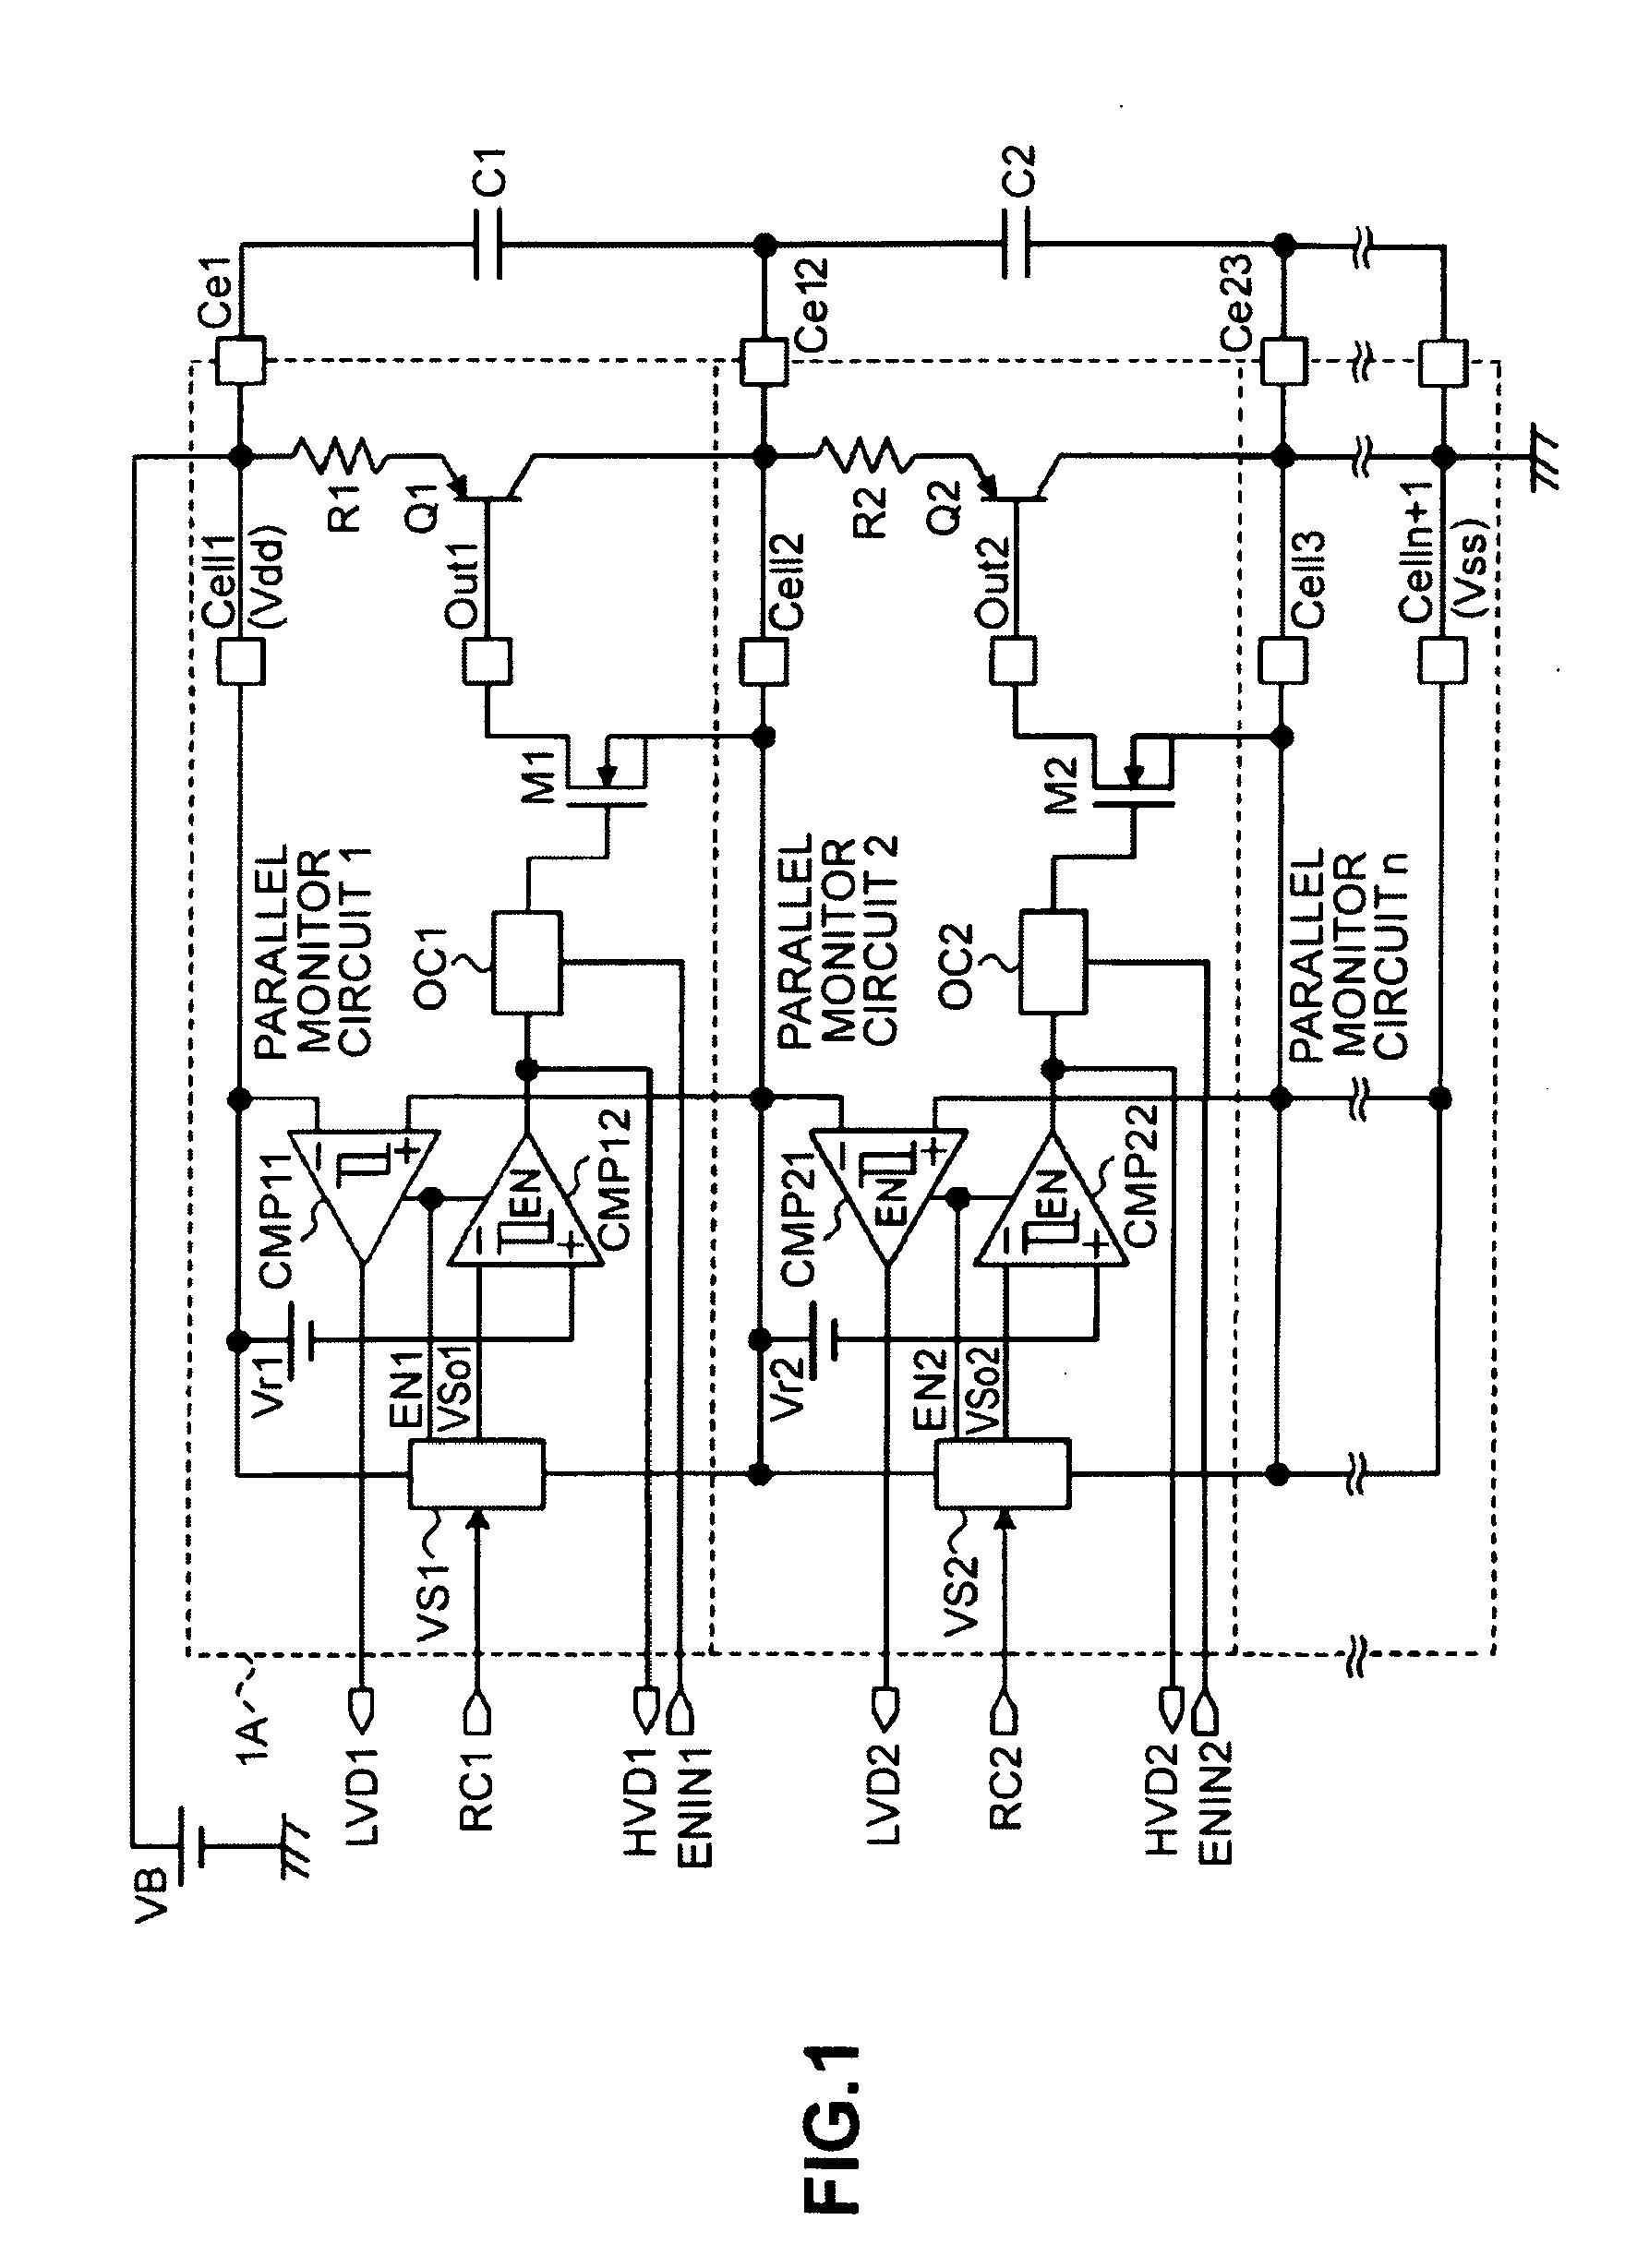 patent ep1583200b1